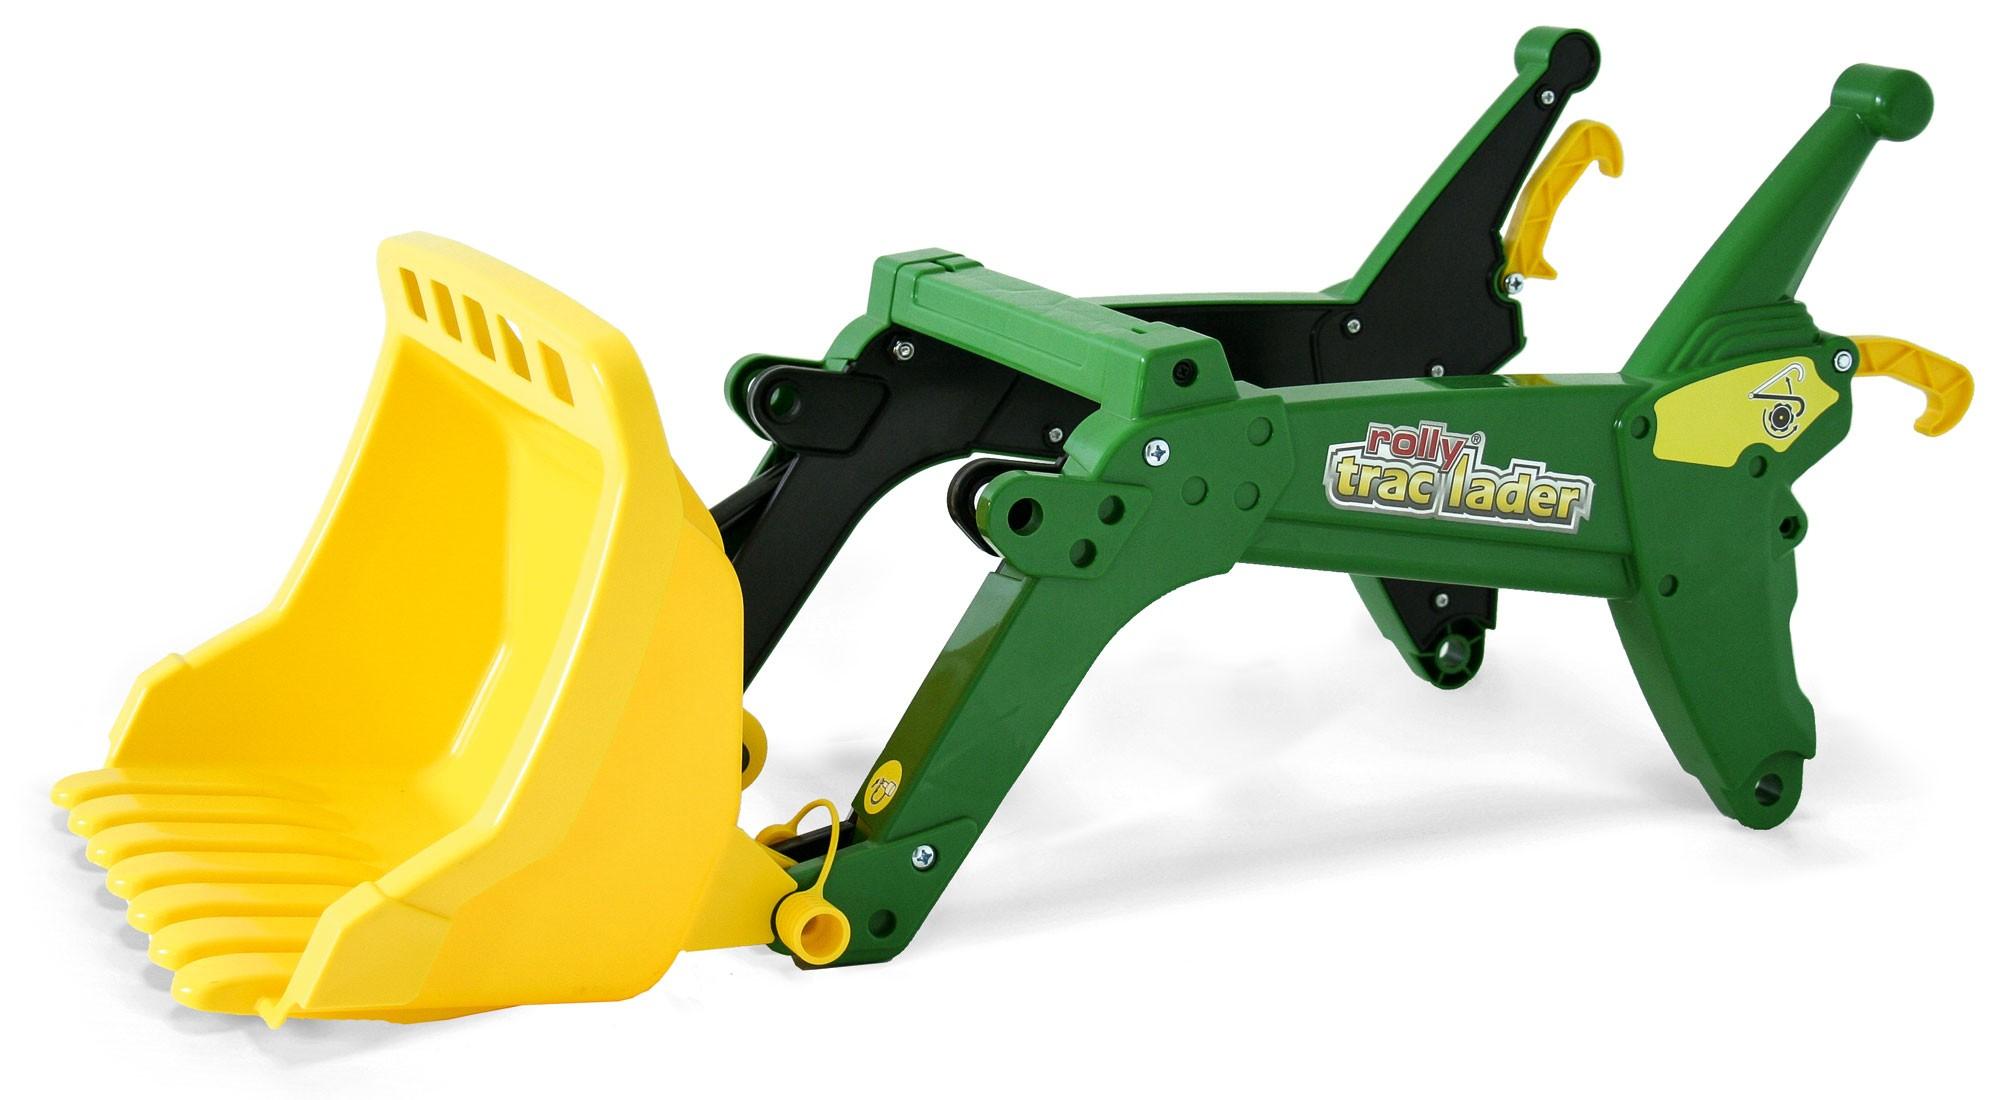 Frontlader für Tretfahrzeug rolly Trac Lader John Deere - Rolly Toys Bild 1